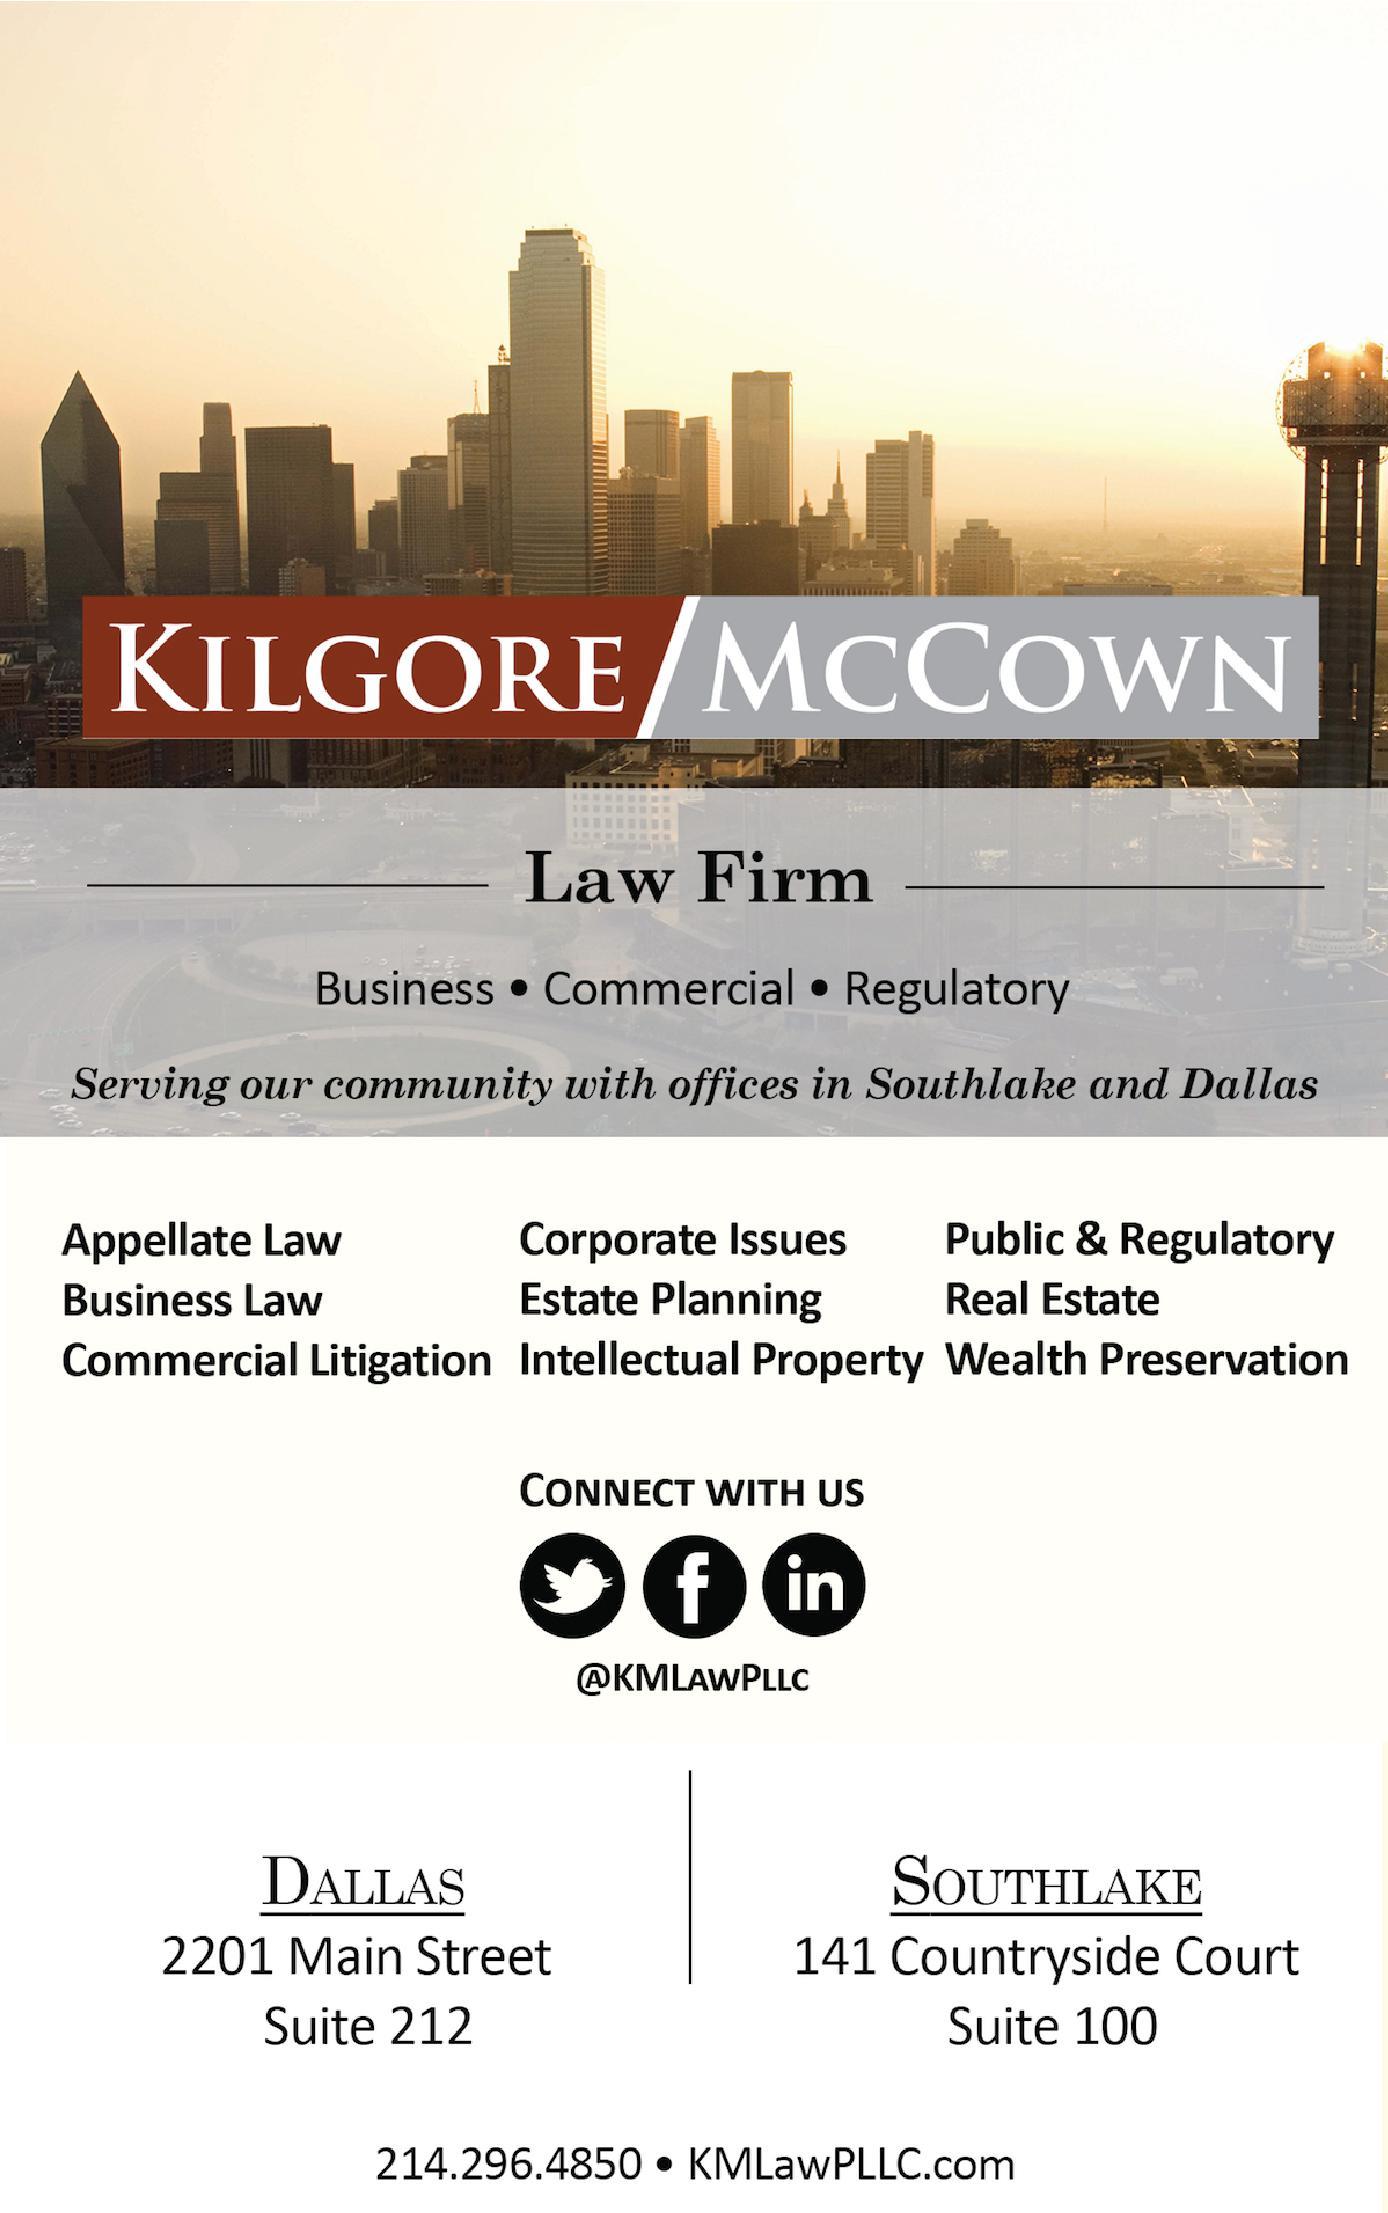 Kilgore/McCown Law Firm